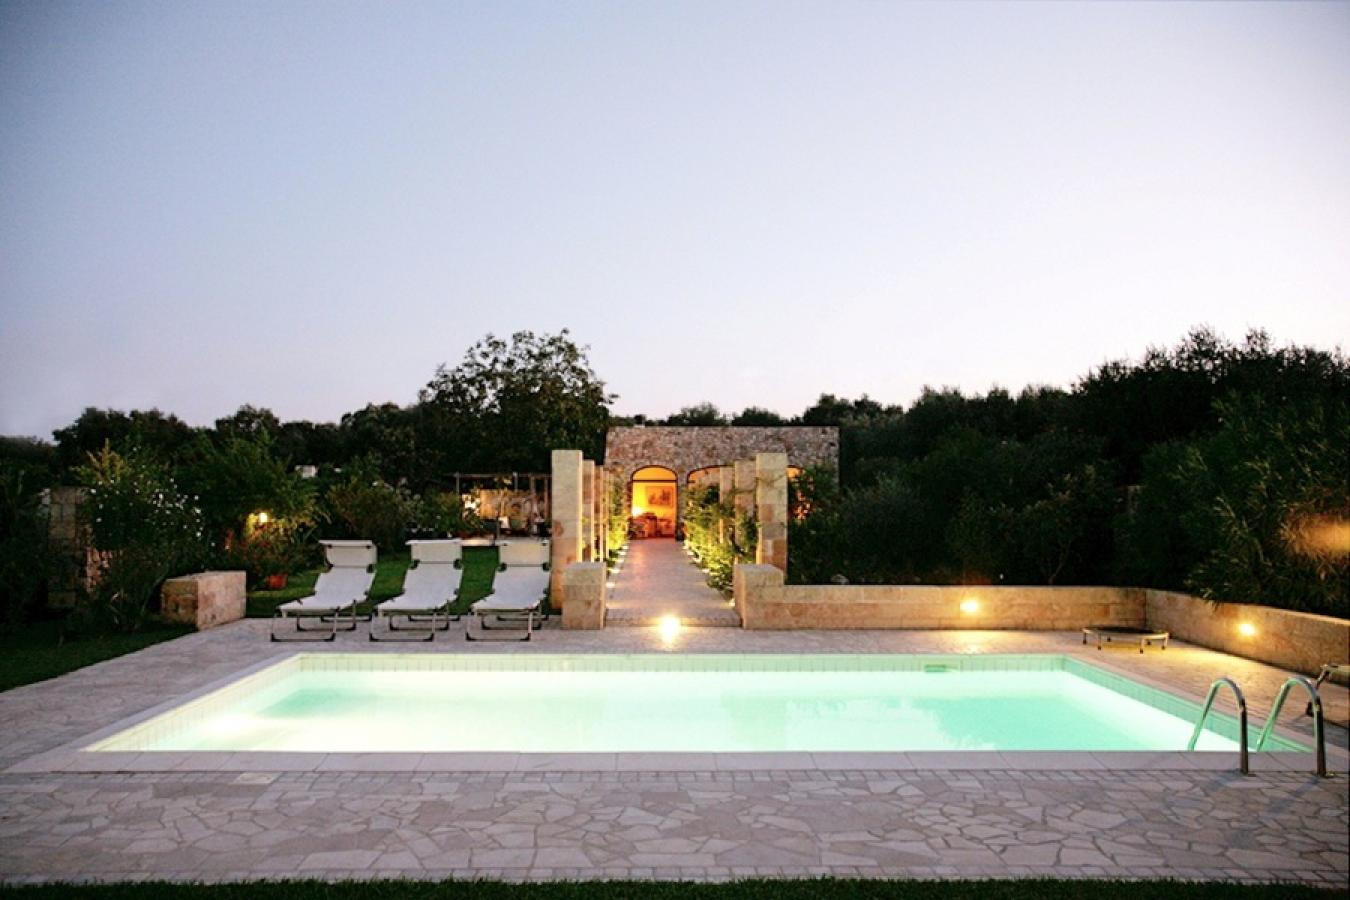 Villa con piscina vicino al mare a castro villa chianchedda - Villa con piscina ...